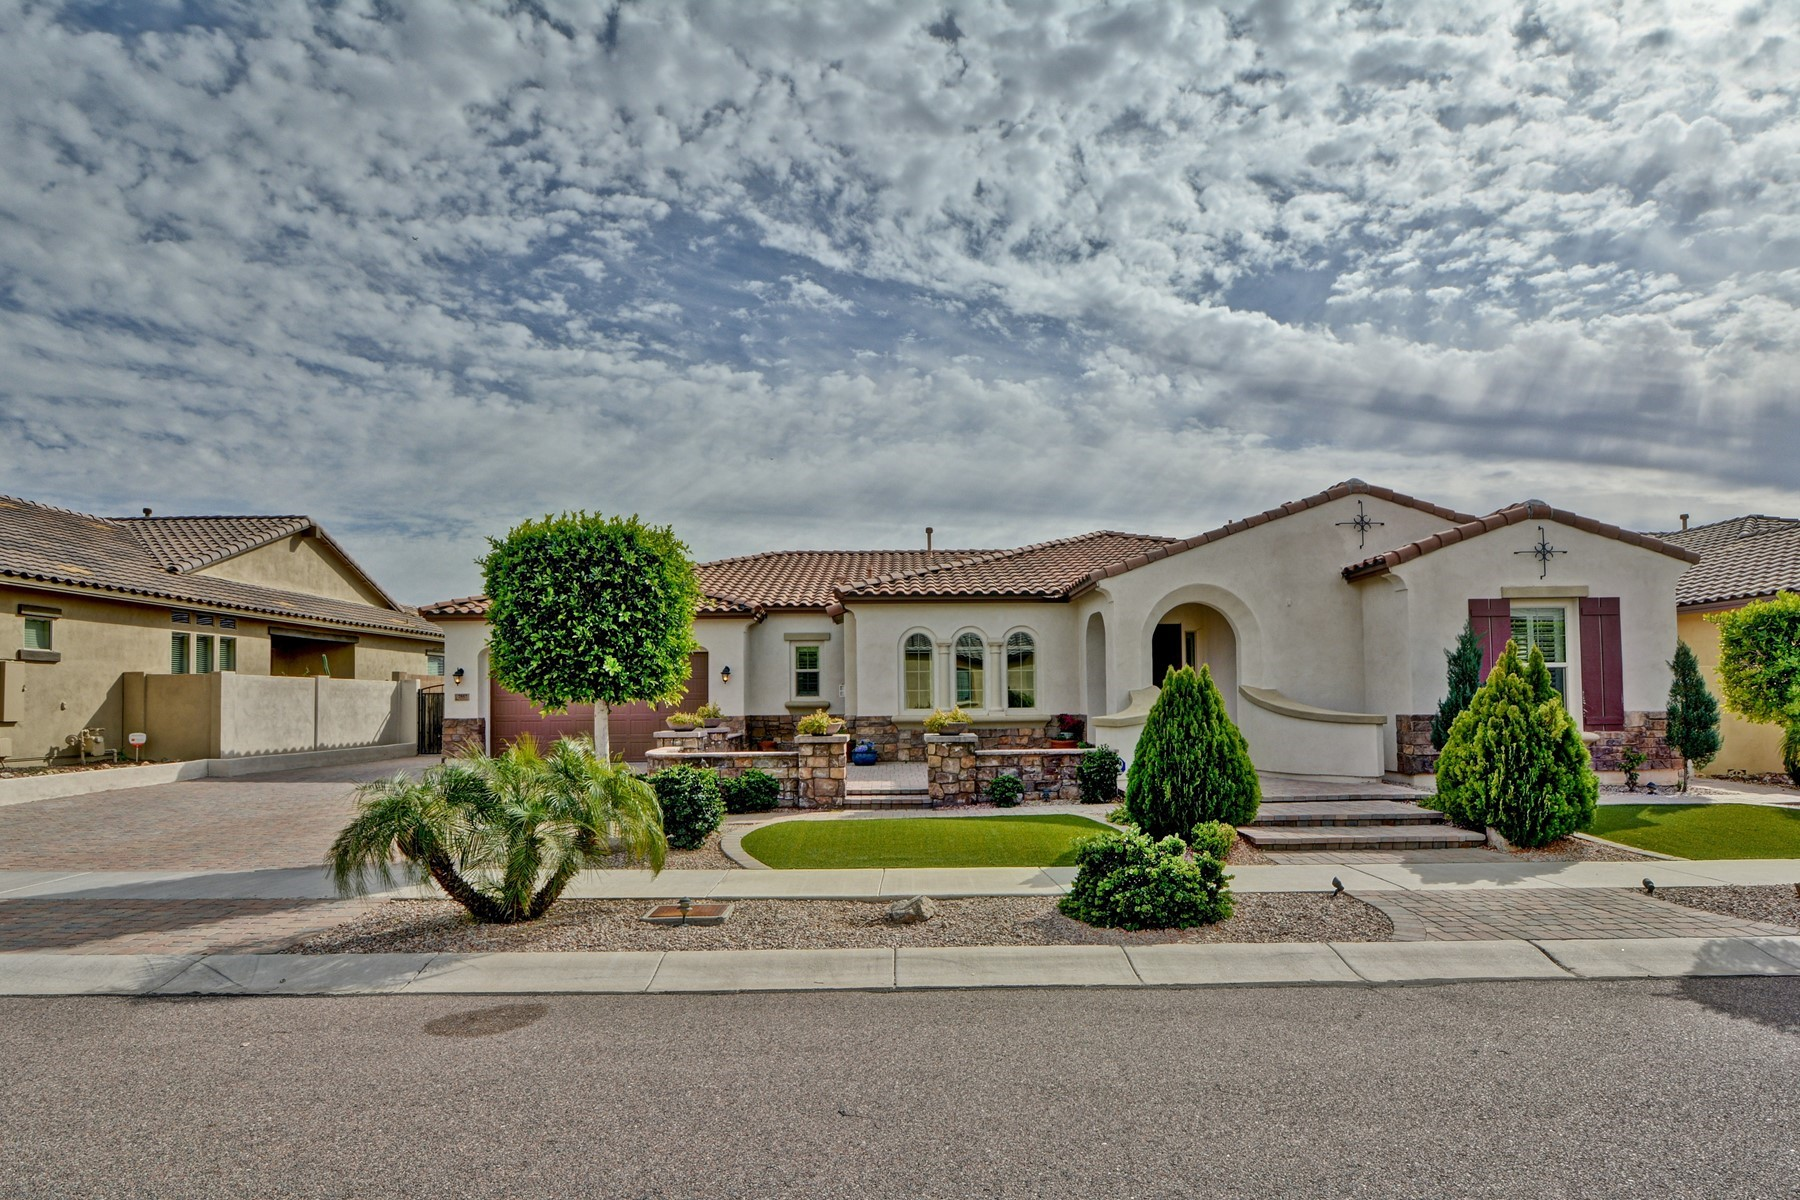 Single Family Homes για την Πώληση στο Reserve At Eagle Heights 7557 W QUAIL AVE, Glendale, Αριζονα 85308 Ηνωμένες Πολιτείες